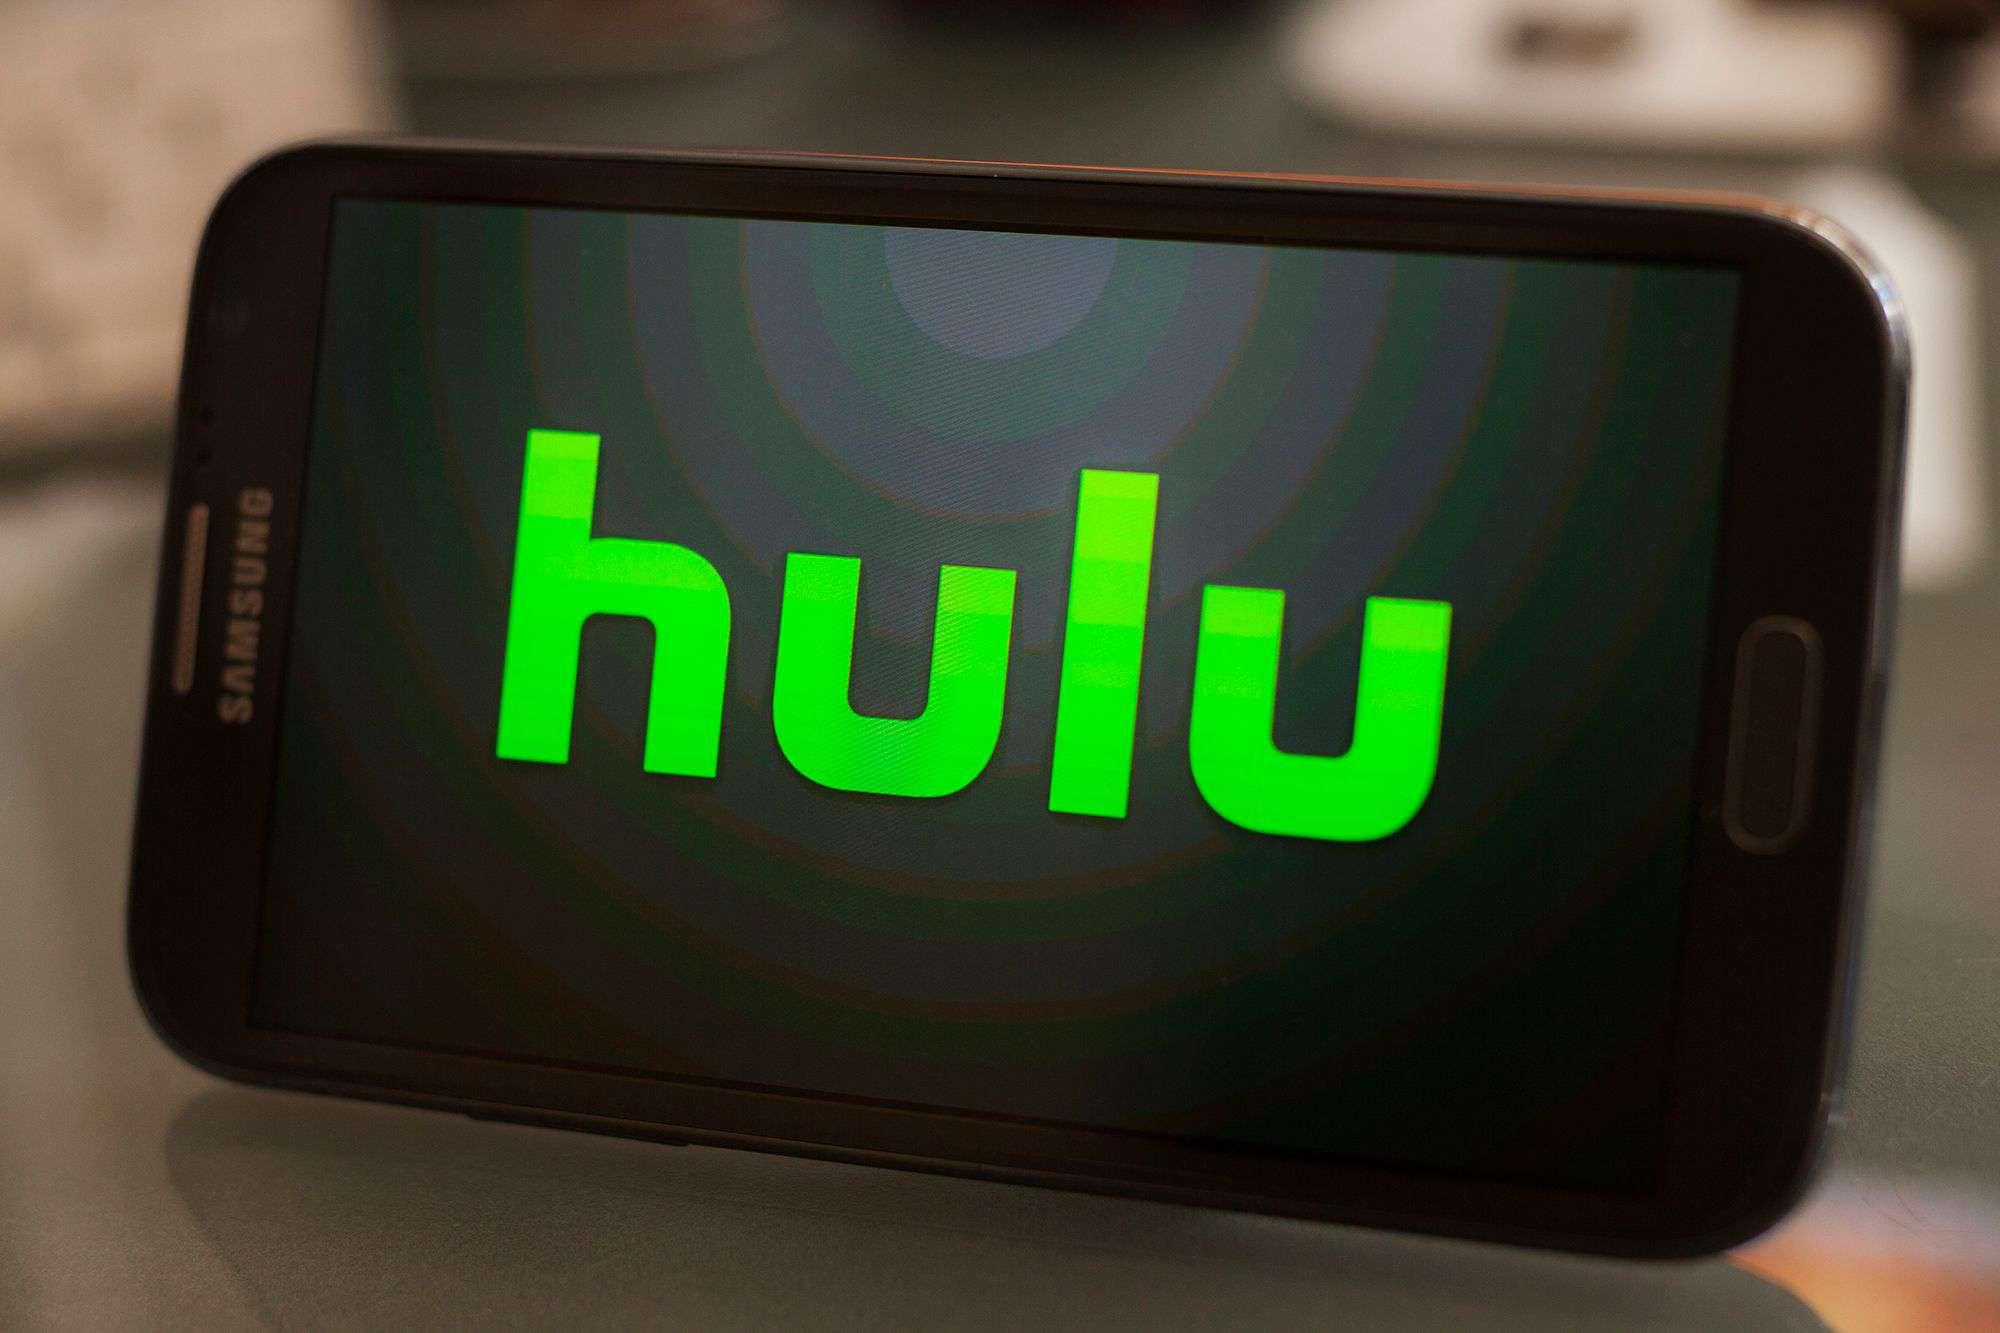 Hulu on a smartphone